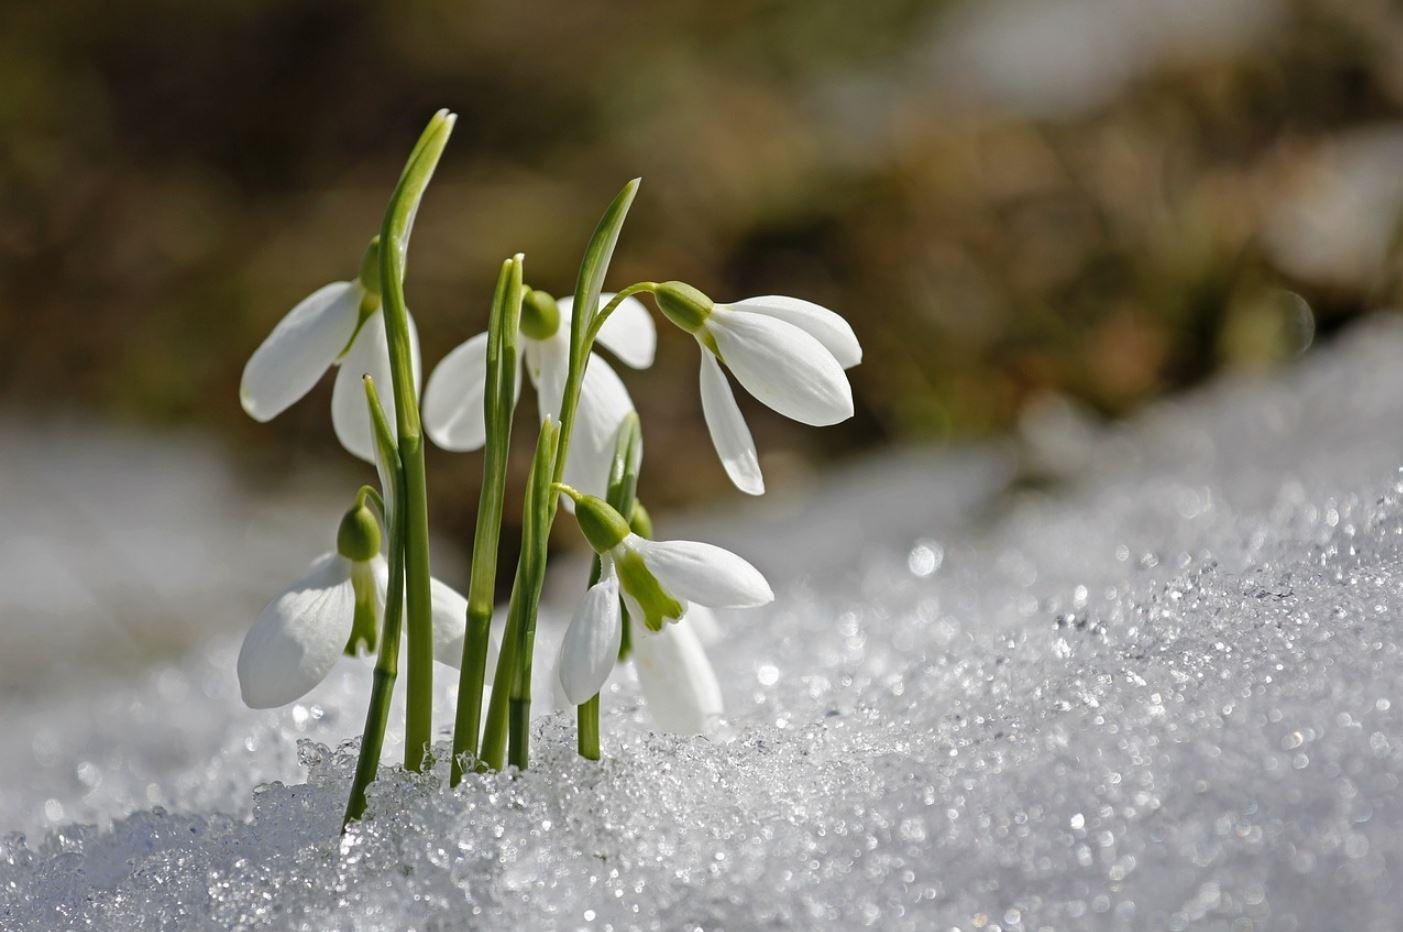 картинки весна природа (14)